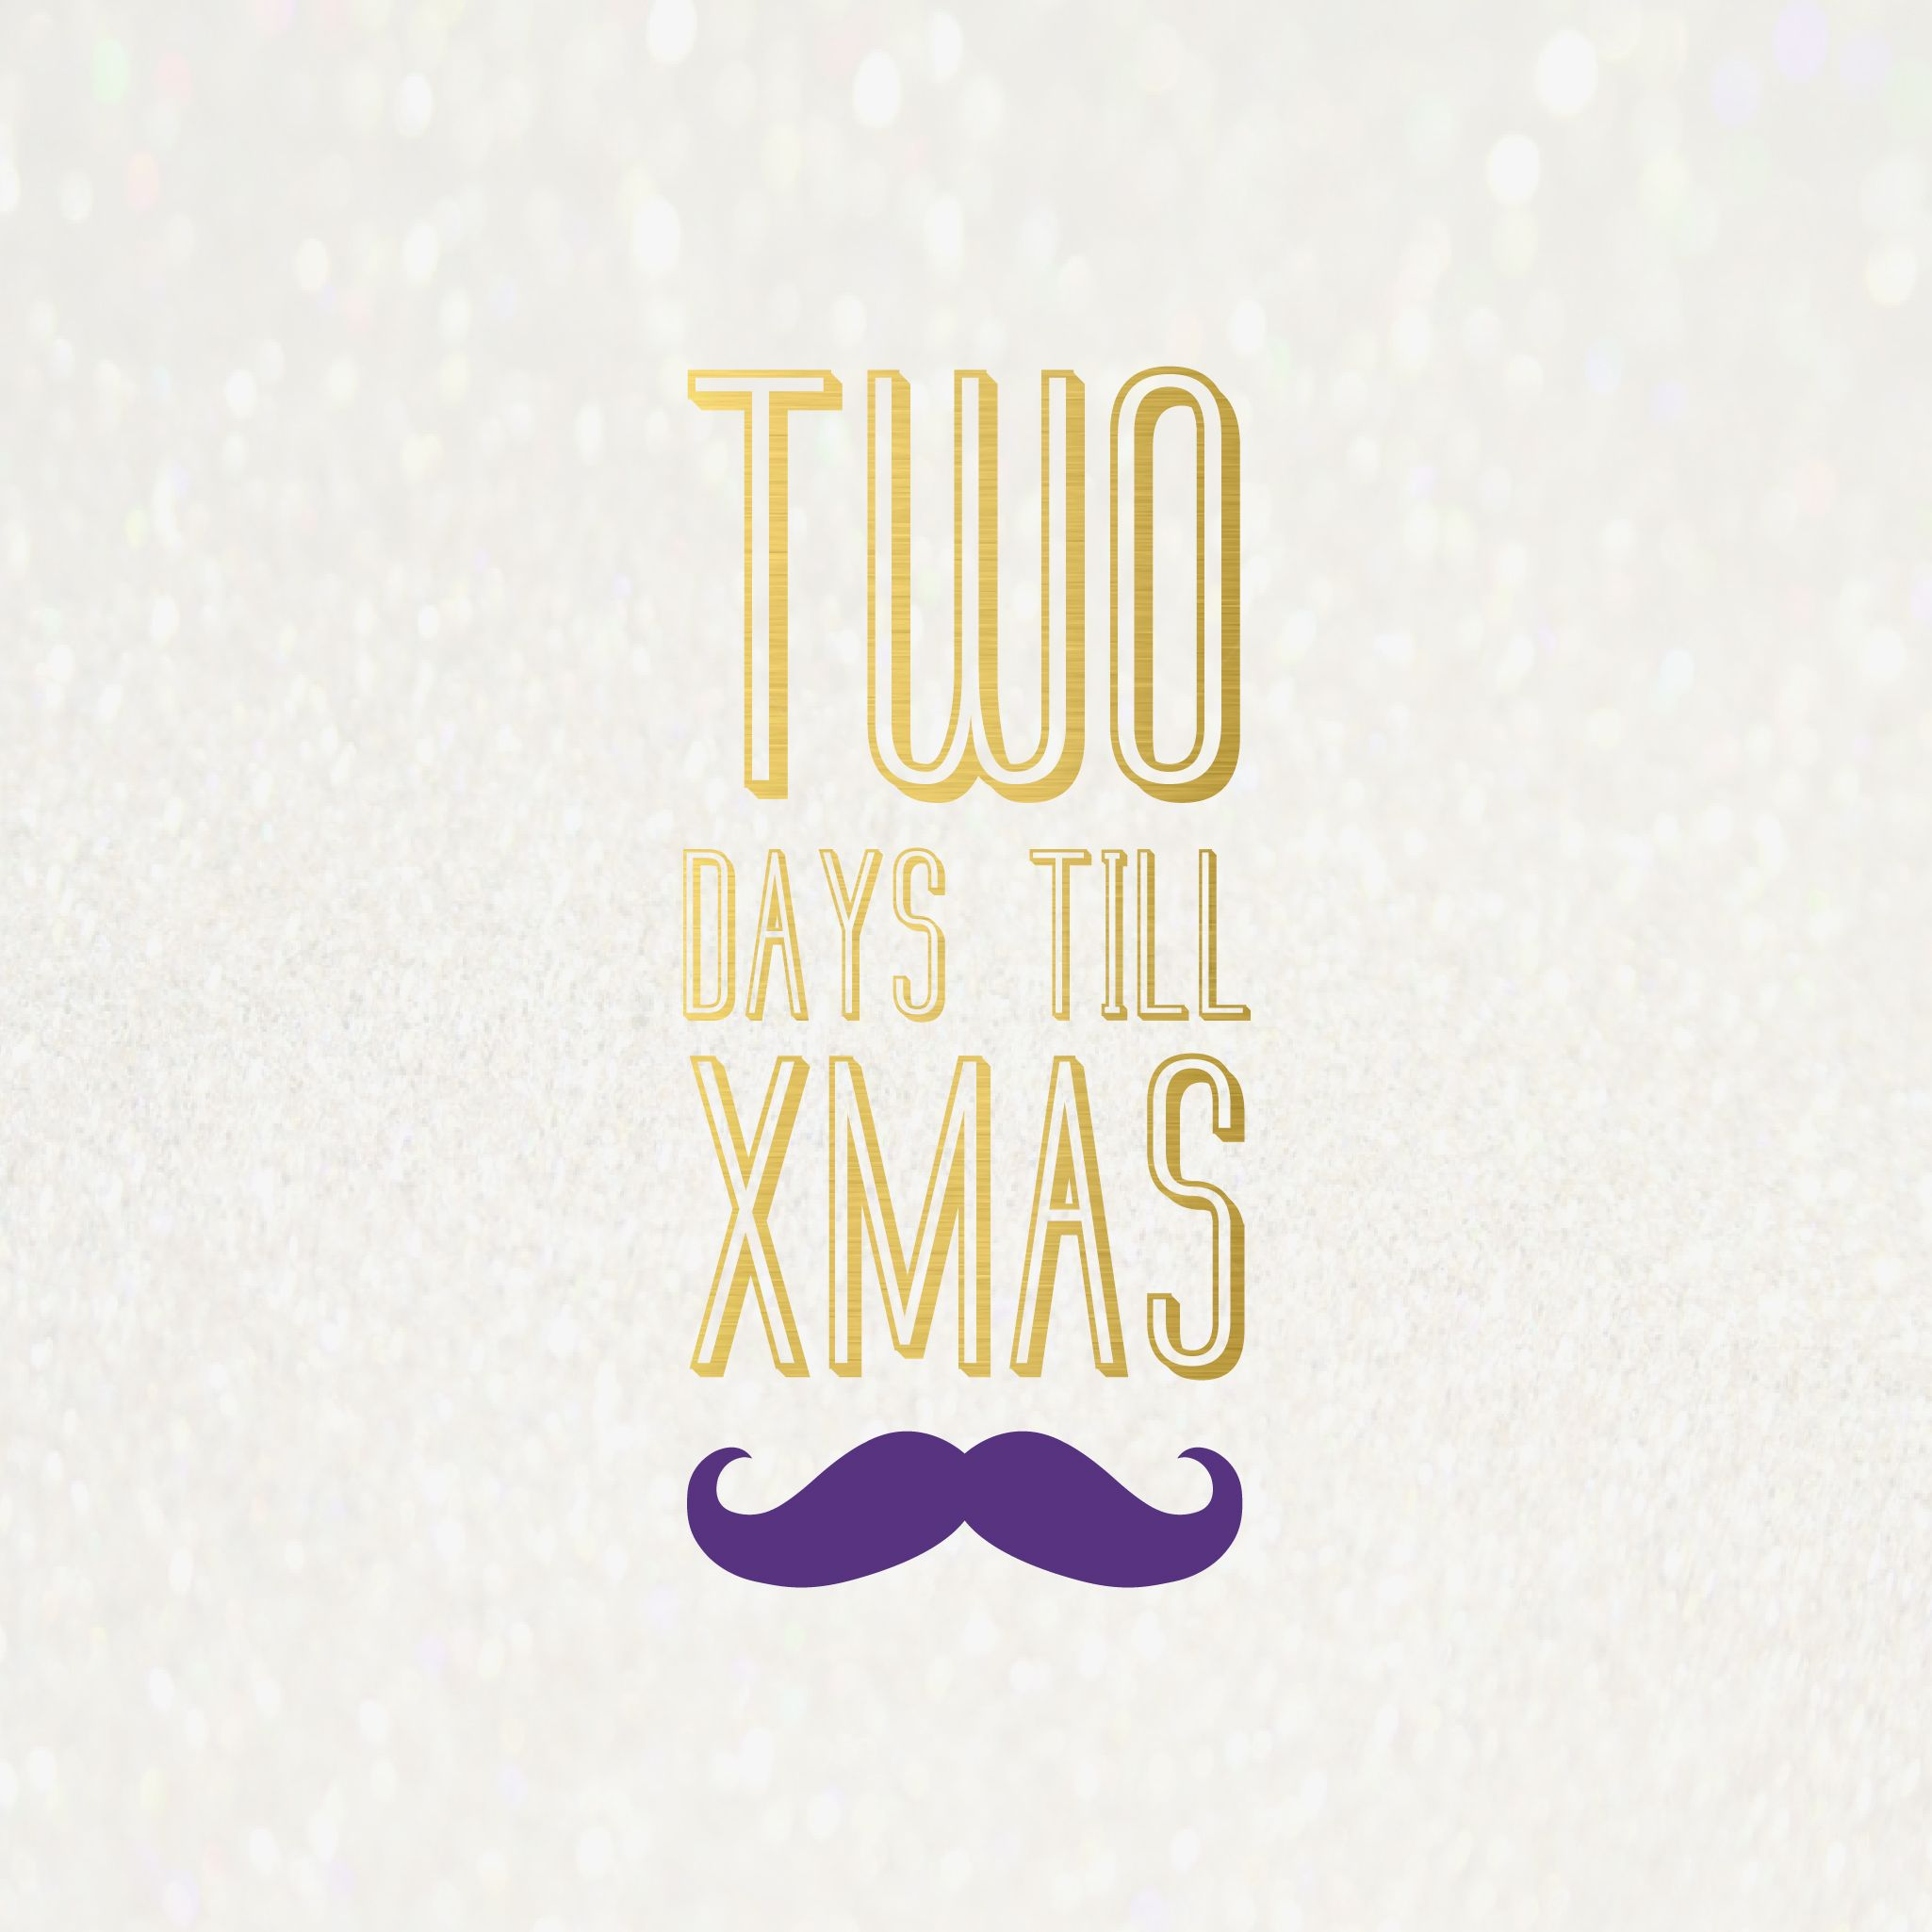 2 more days till Christmas xmas 2days countdown